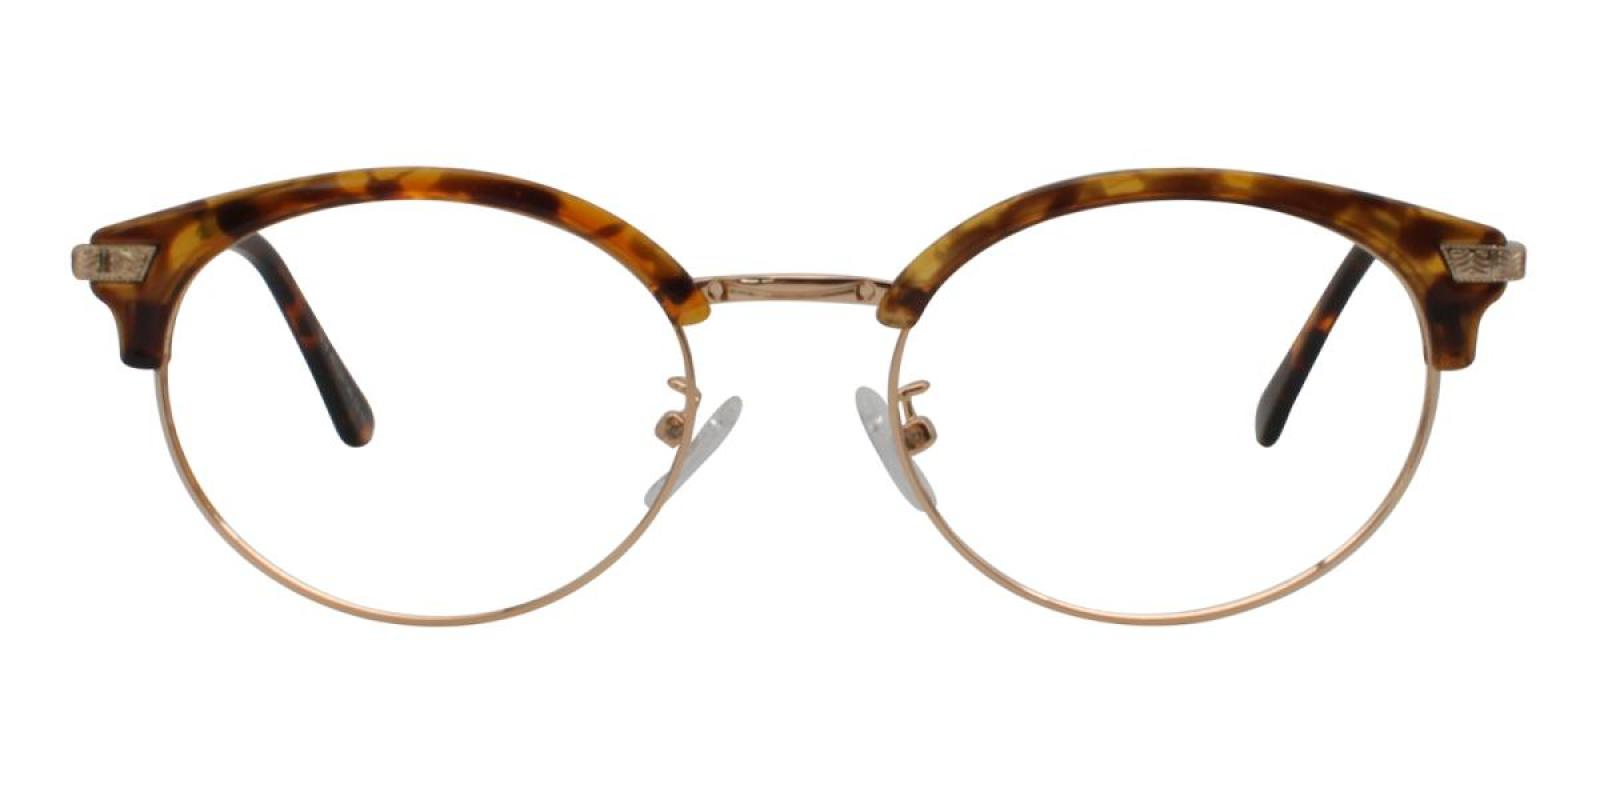 Atlandis-Leopard-Browline-Combination / Metal / TR-Eyeglasses-additional2